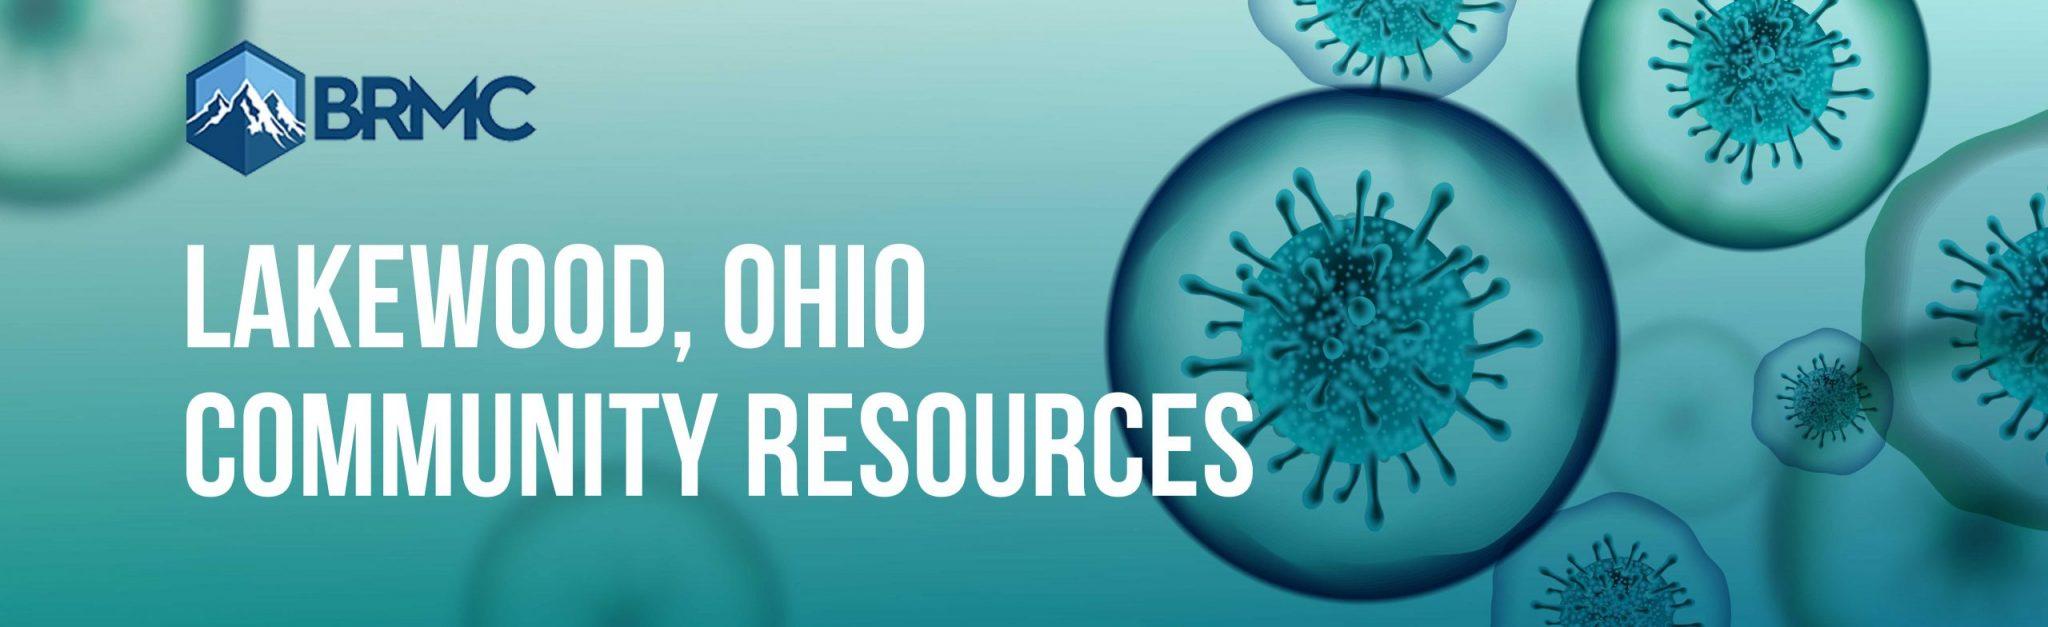 Lakewood, Ohio Coronavirus Community Resources